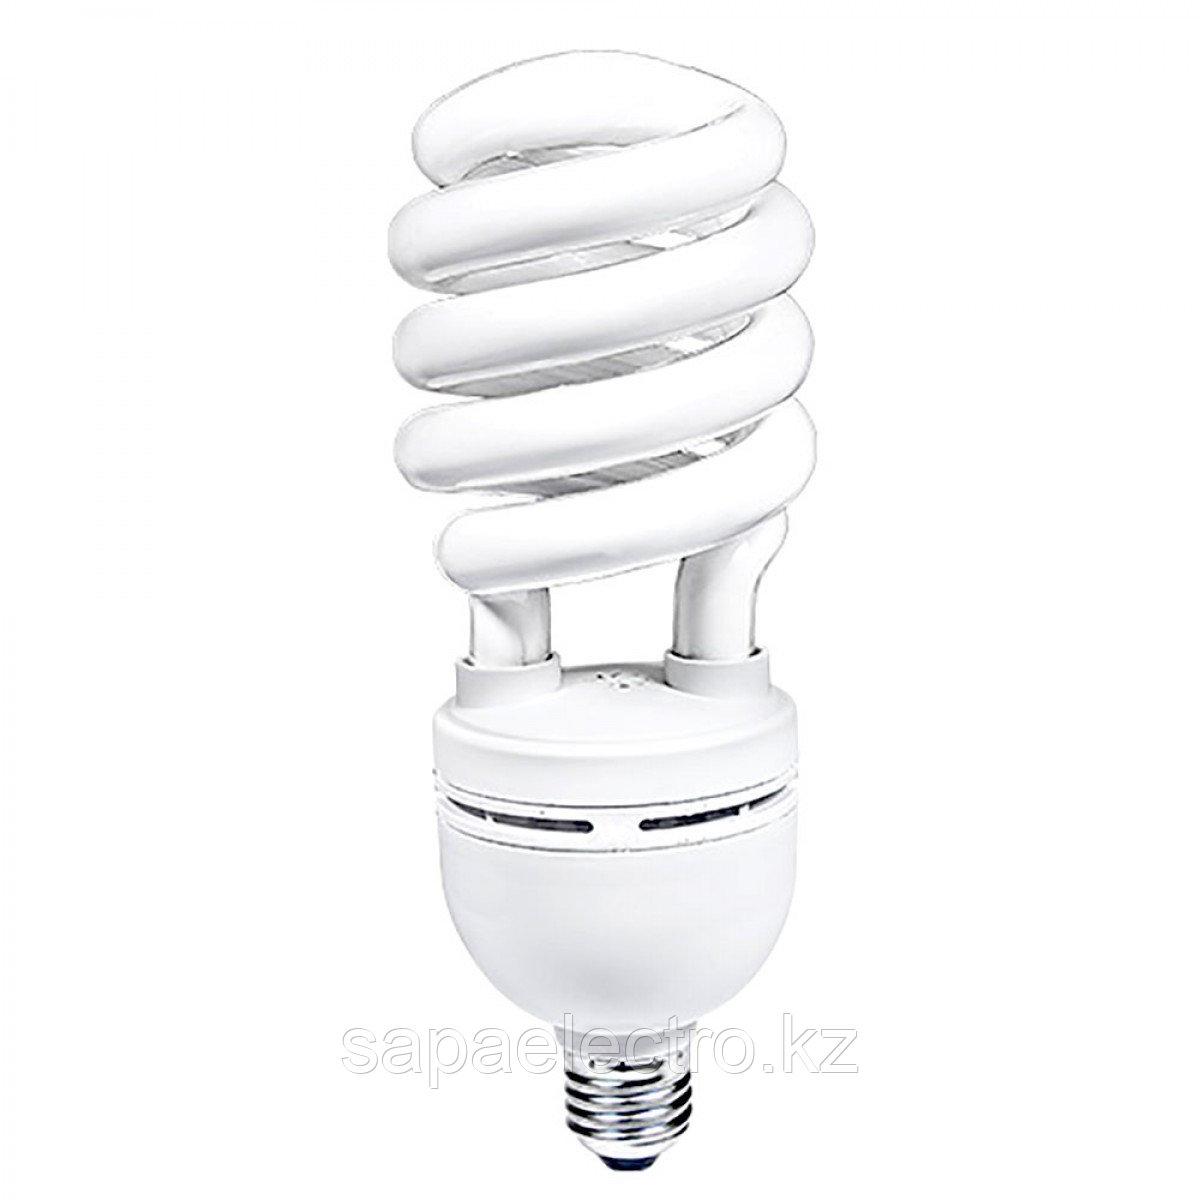 Лампа SPIRAL 42W E27 827 (TECHNOLIGHT)25шт